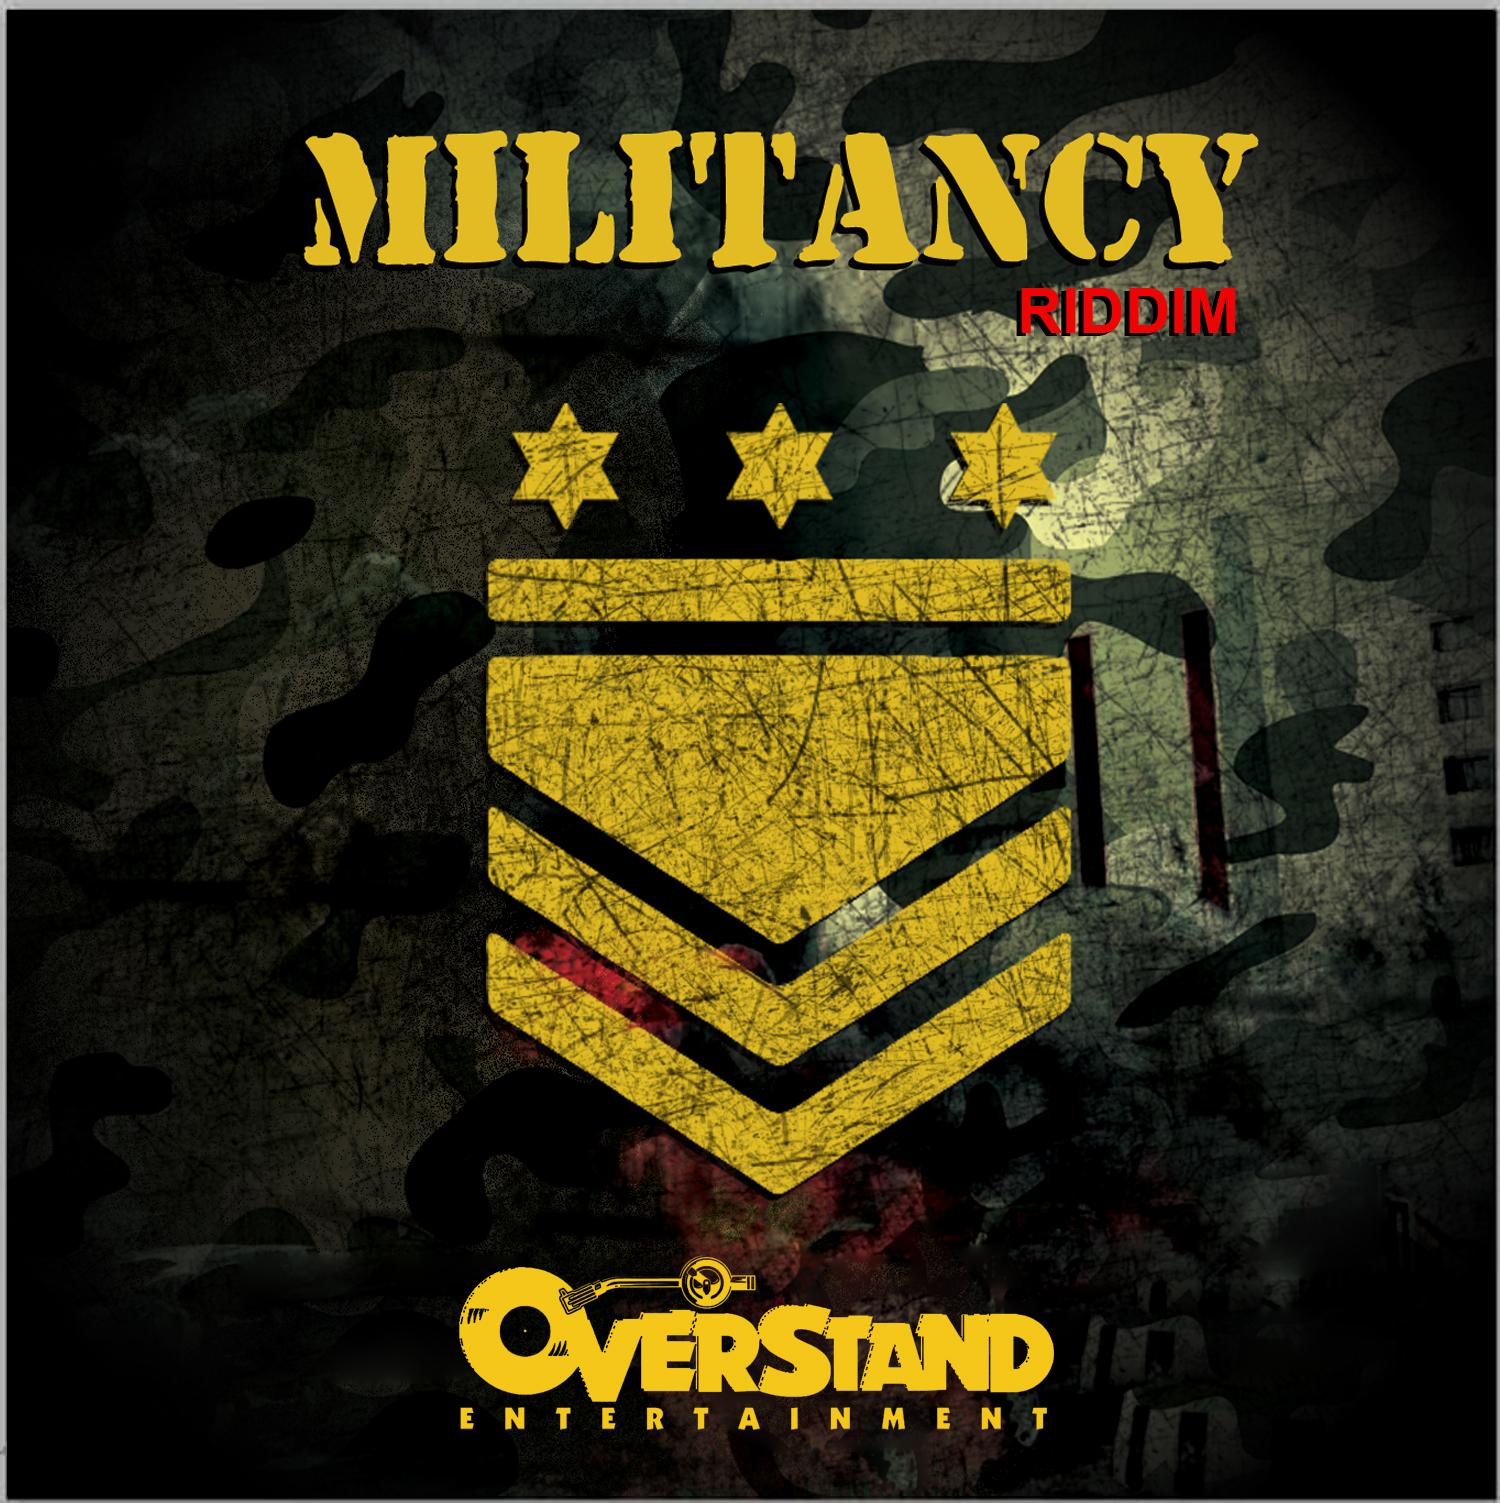 MILITANCY RIDDIM – OVERSTAND ENTERTAINMENT